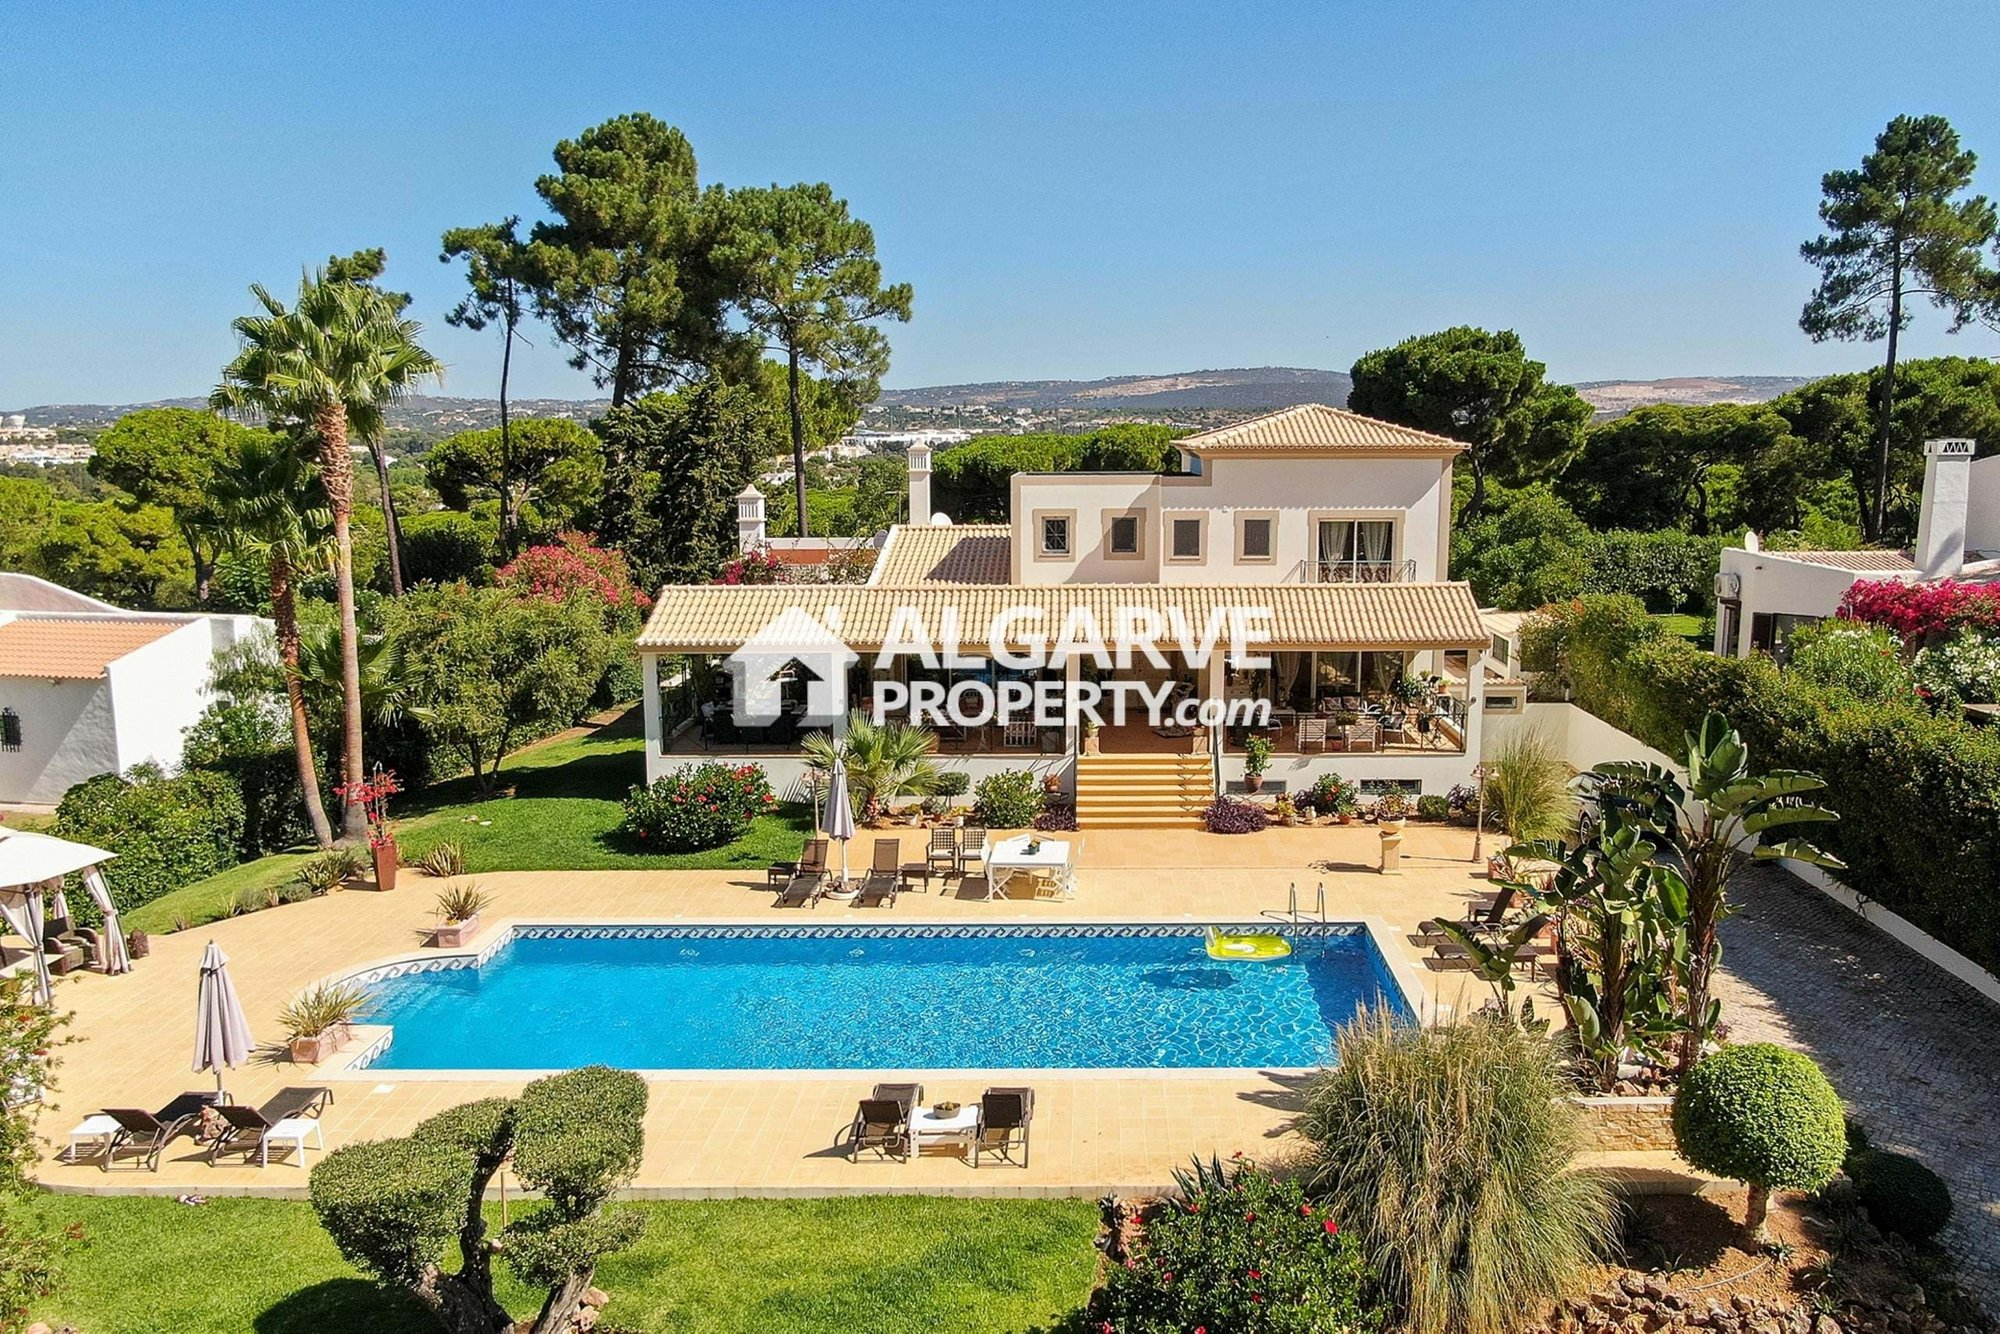 Villa in Faro, Algarve, Portugal 1 - 11651005